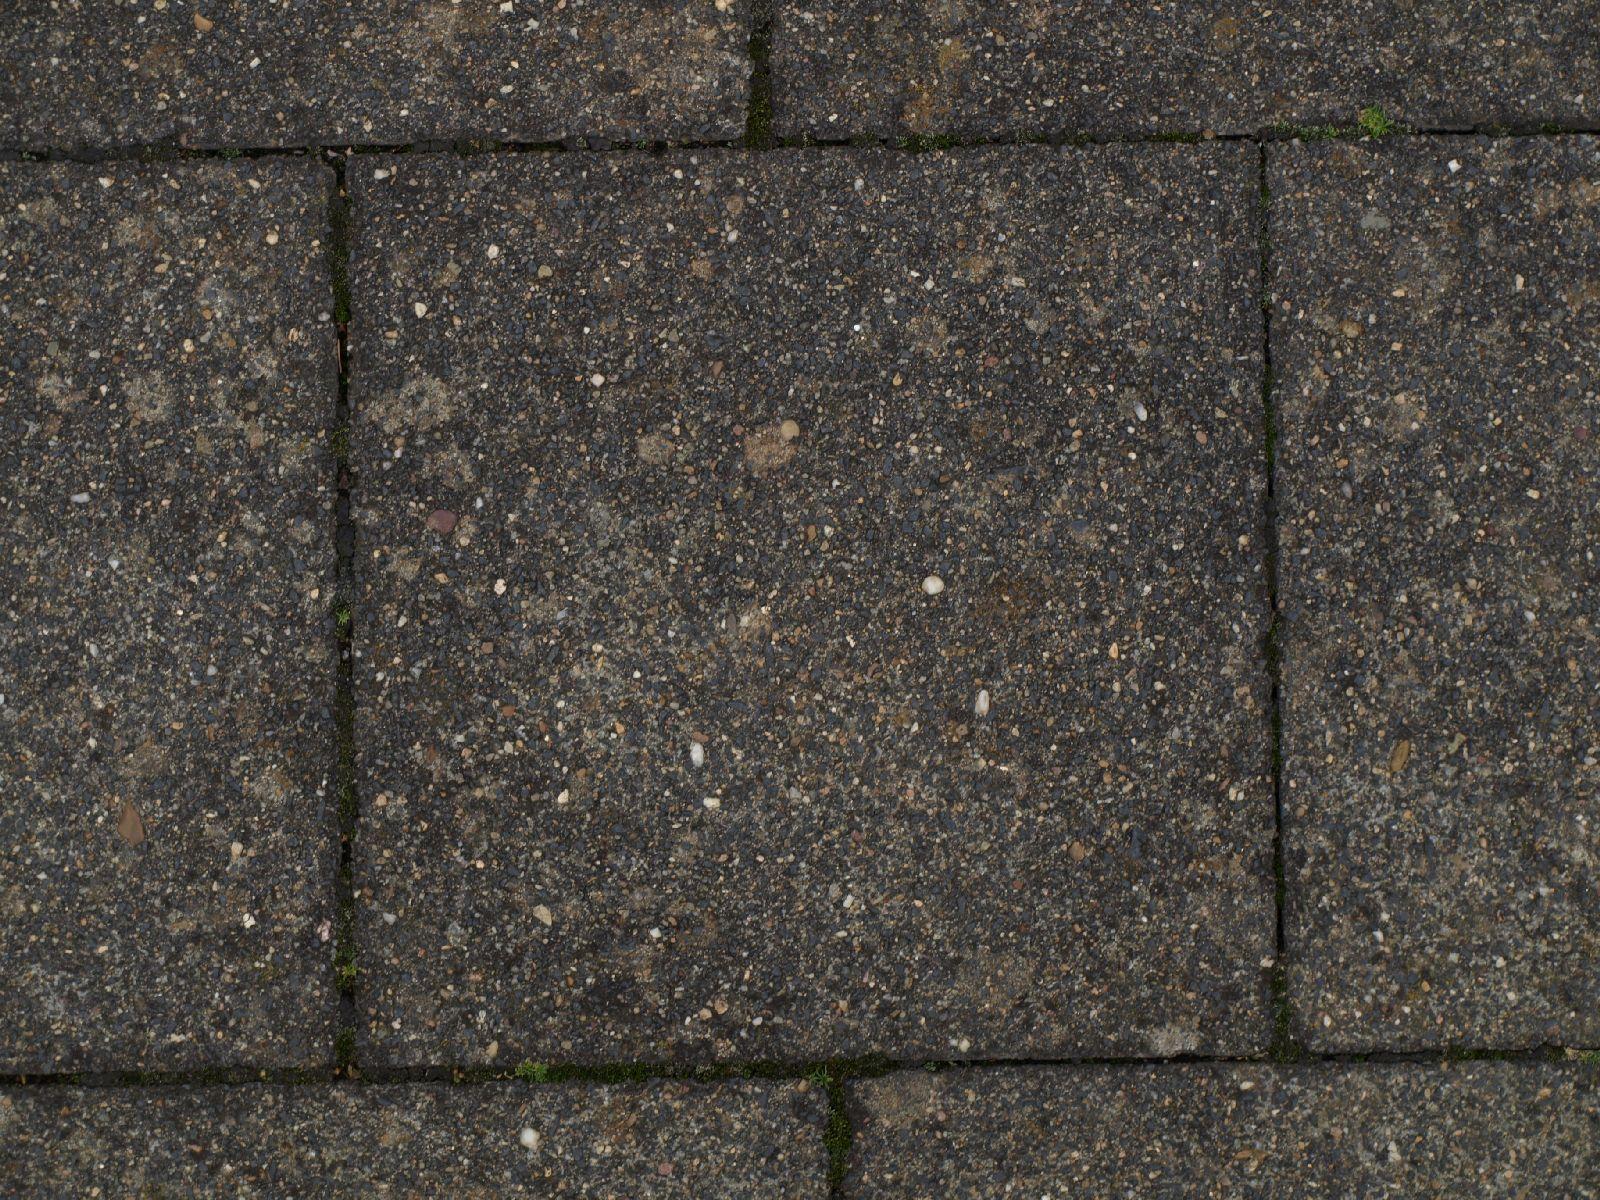 Ground-Urban_Texture_A_PA045717